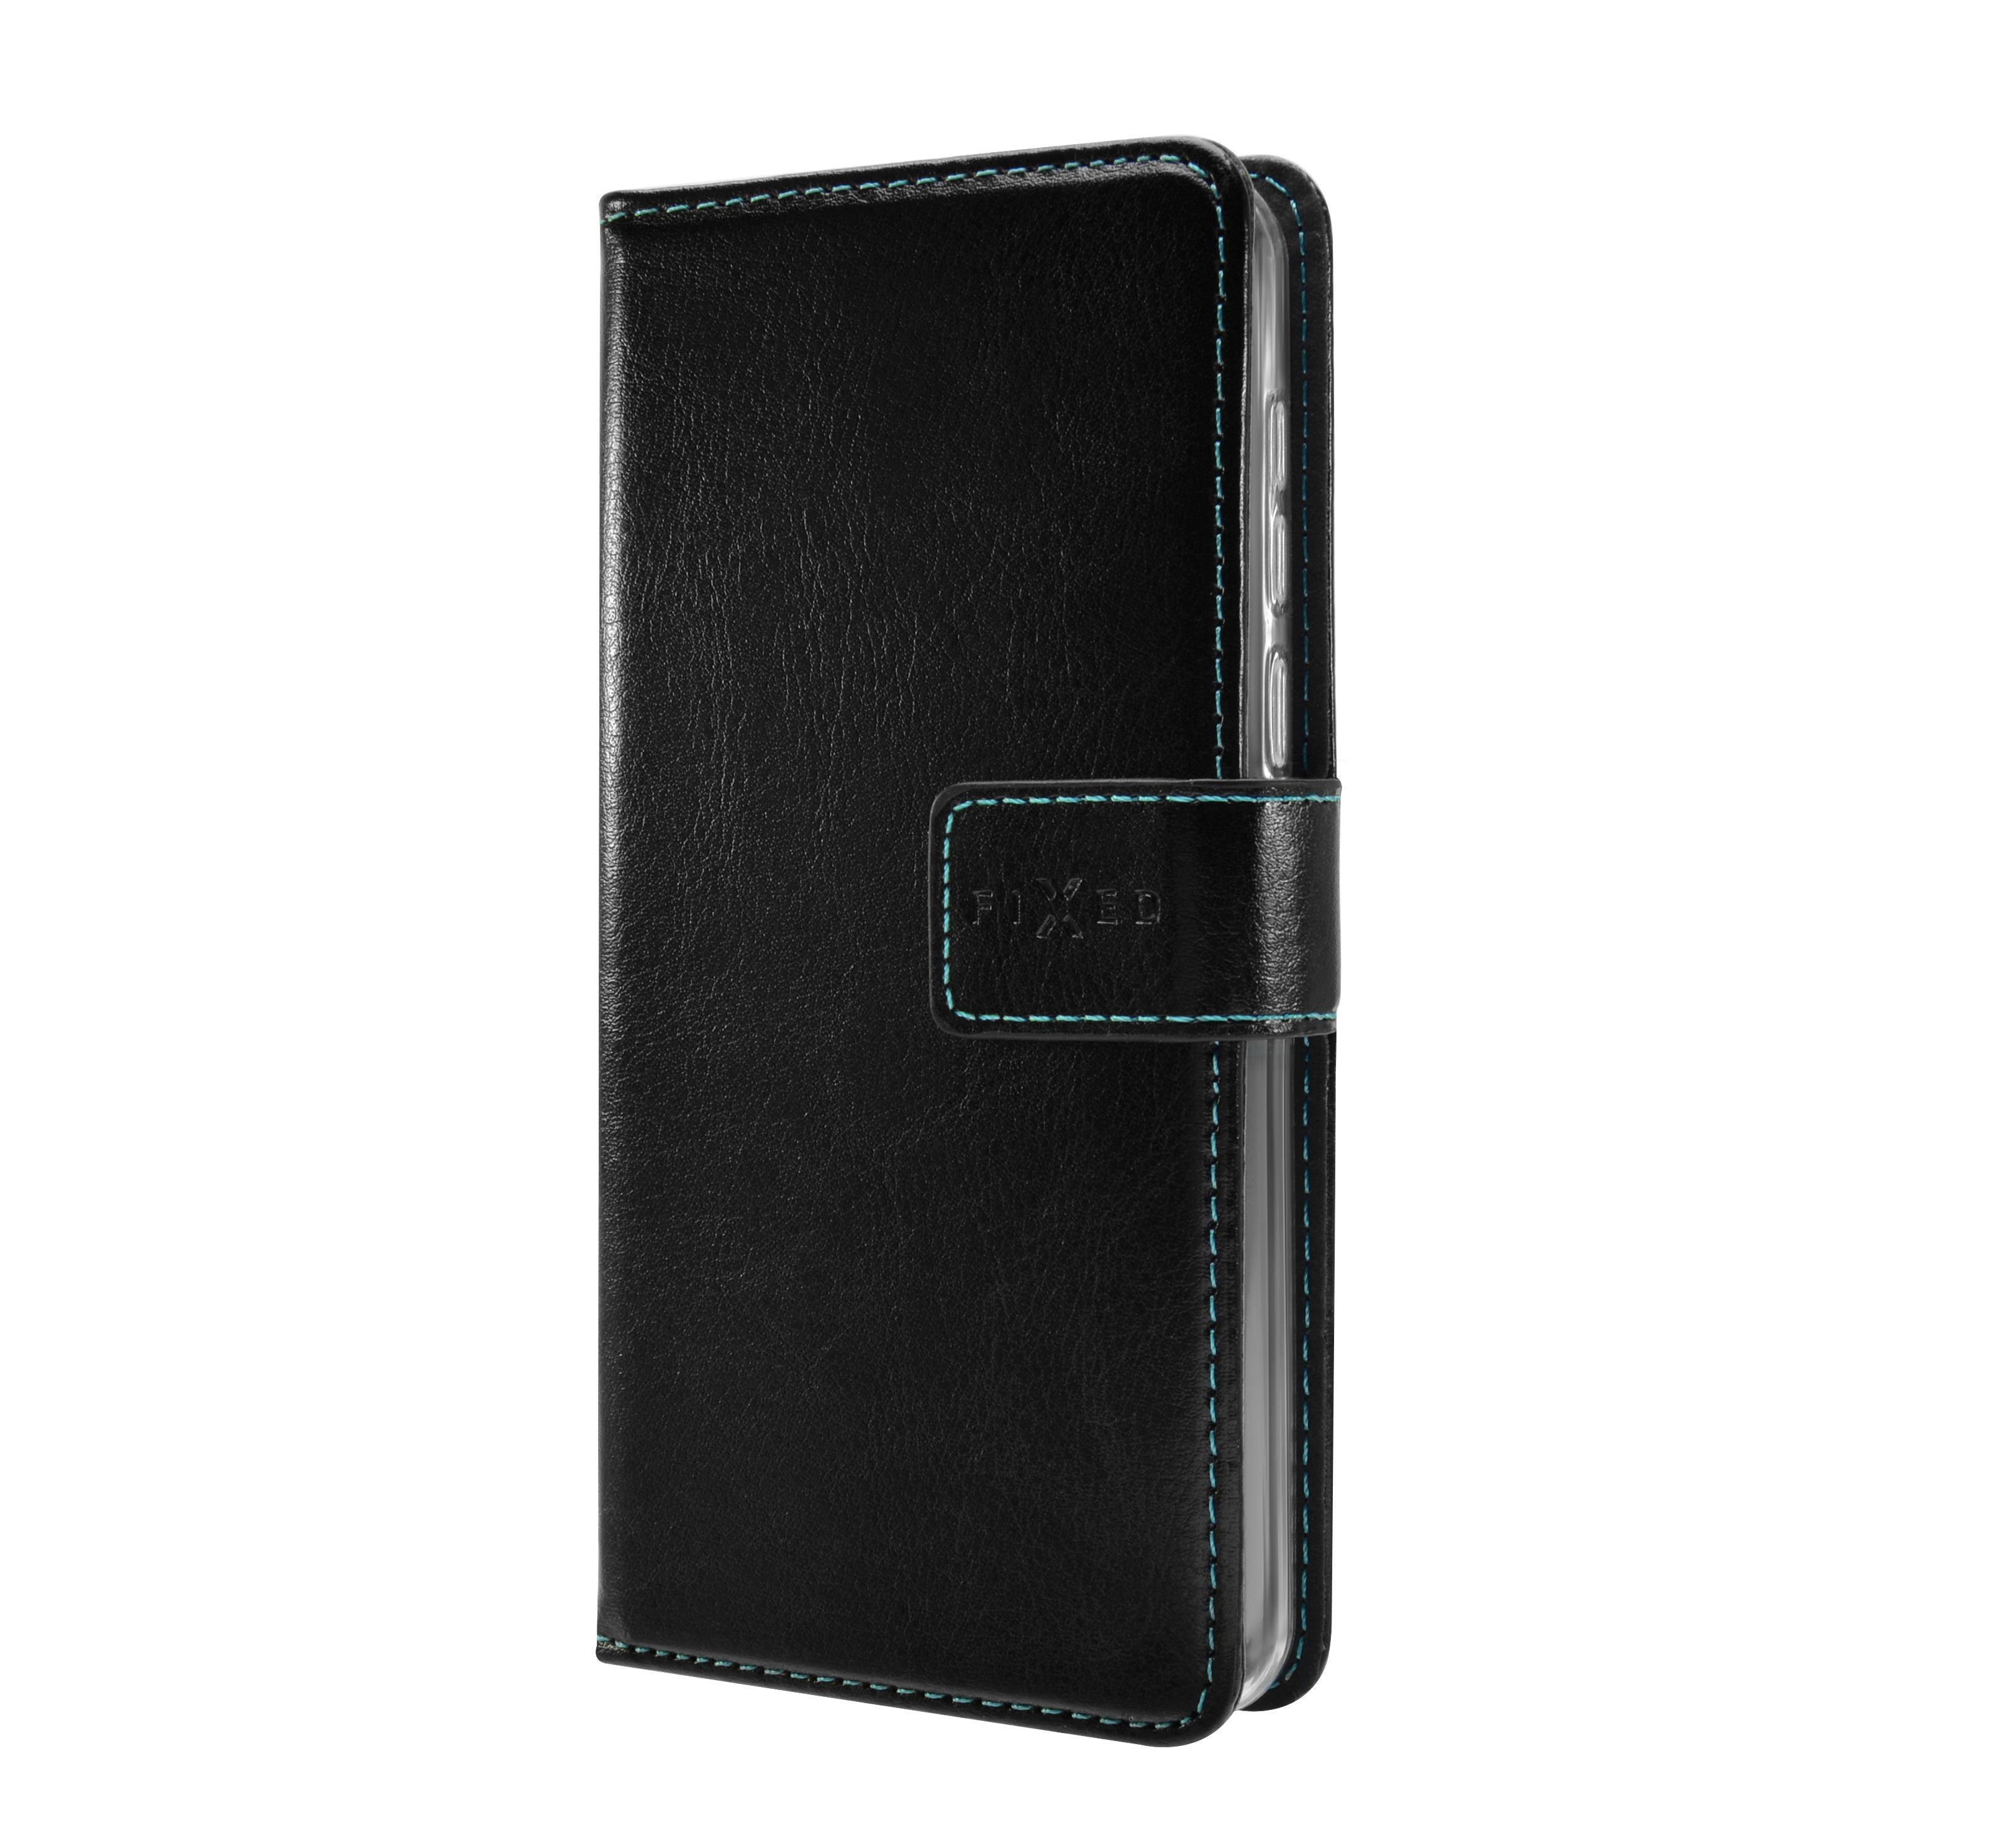 Pouzdro typu kniha FIXED Opus pro Vodafone Smart N9, černé